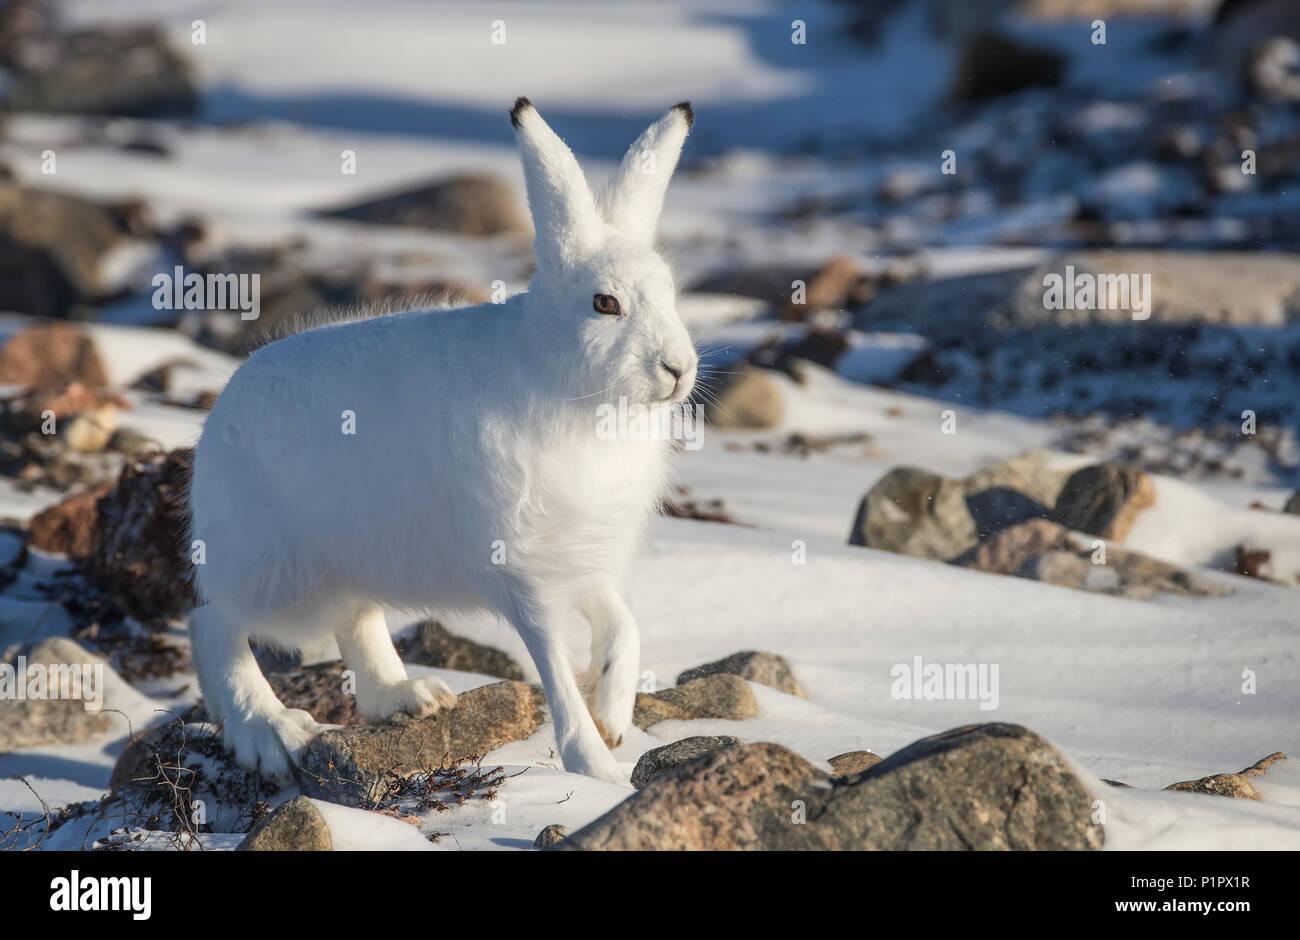 Arktis Hase (Lepus arcticus) im Schnee; Churchill, Manitoba, Kanada Stockbild